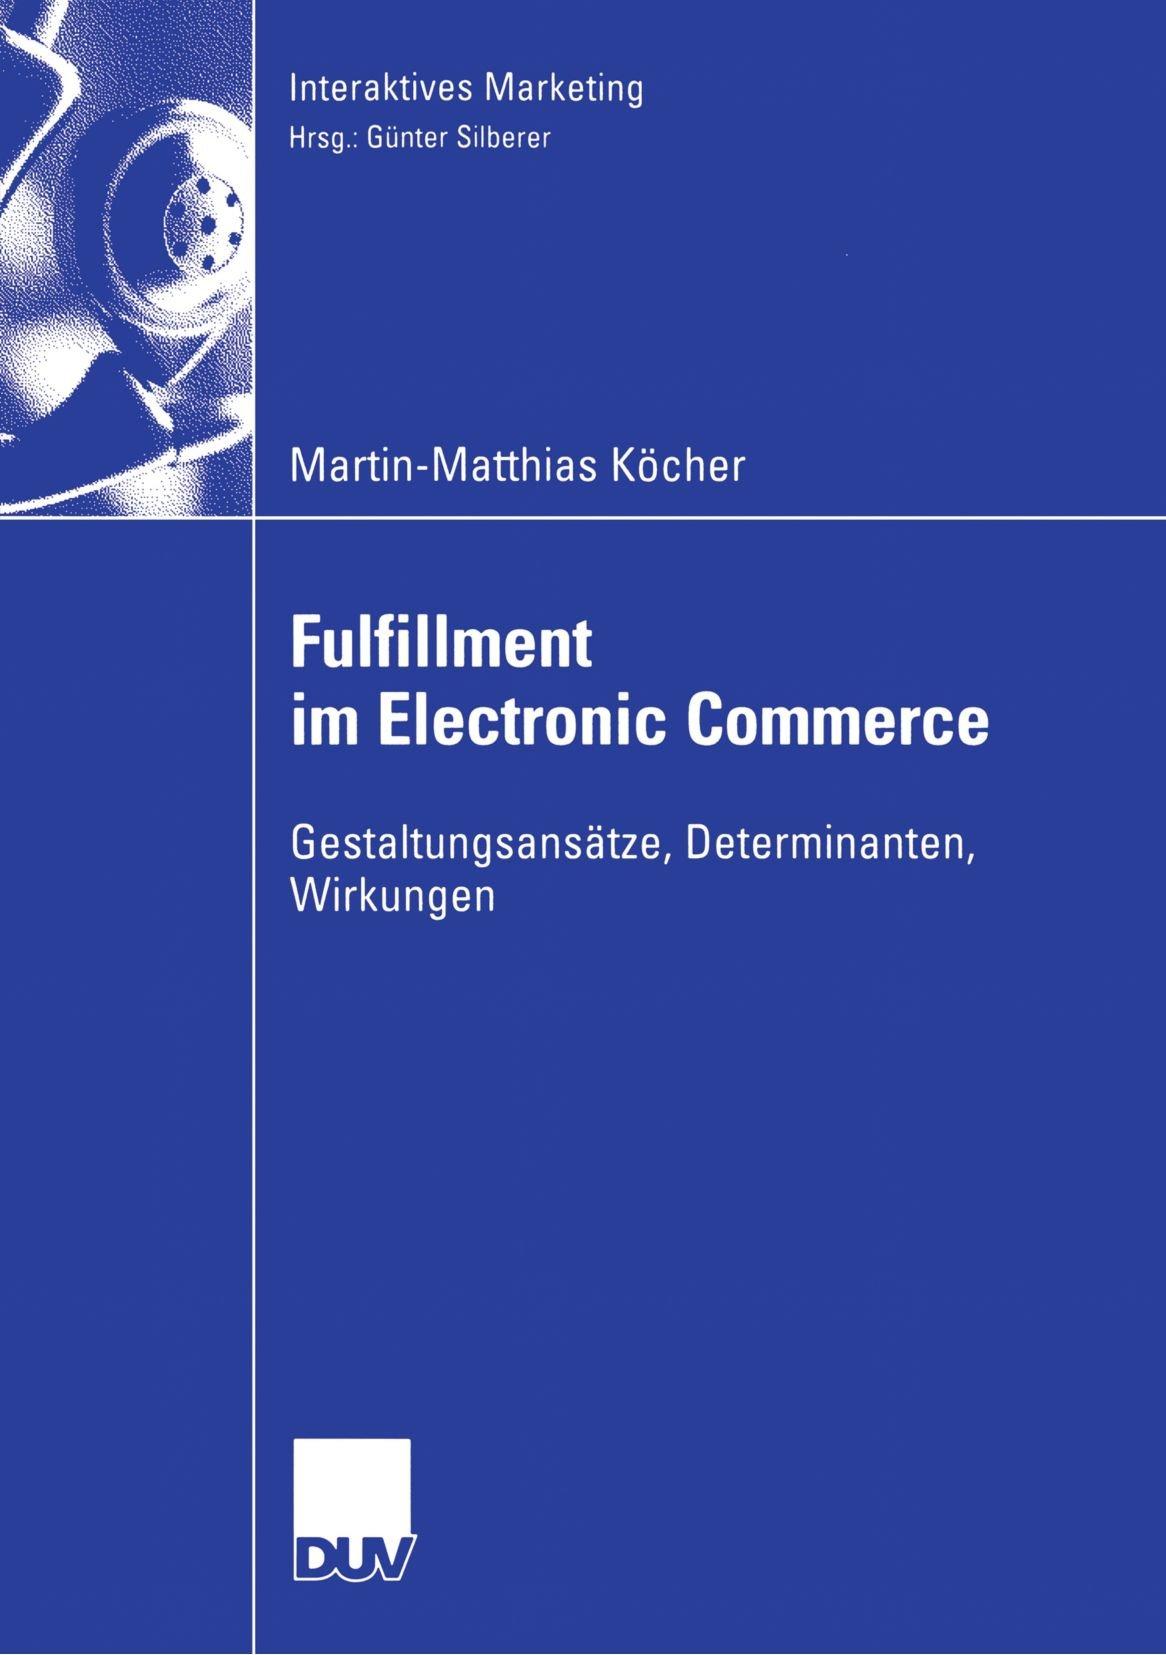 Fulfillment im Electronic Commerce (Interaktives Marketing) Taschenbuch – 26. September 2006 Martin-Matthias Köcher Gabler Verlag 3835004840 Dissertationen